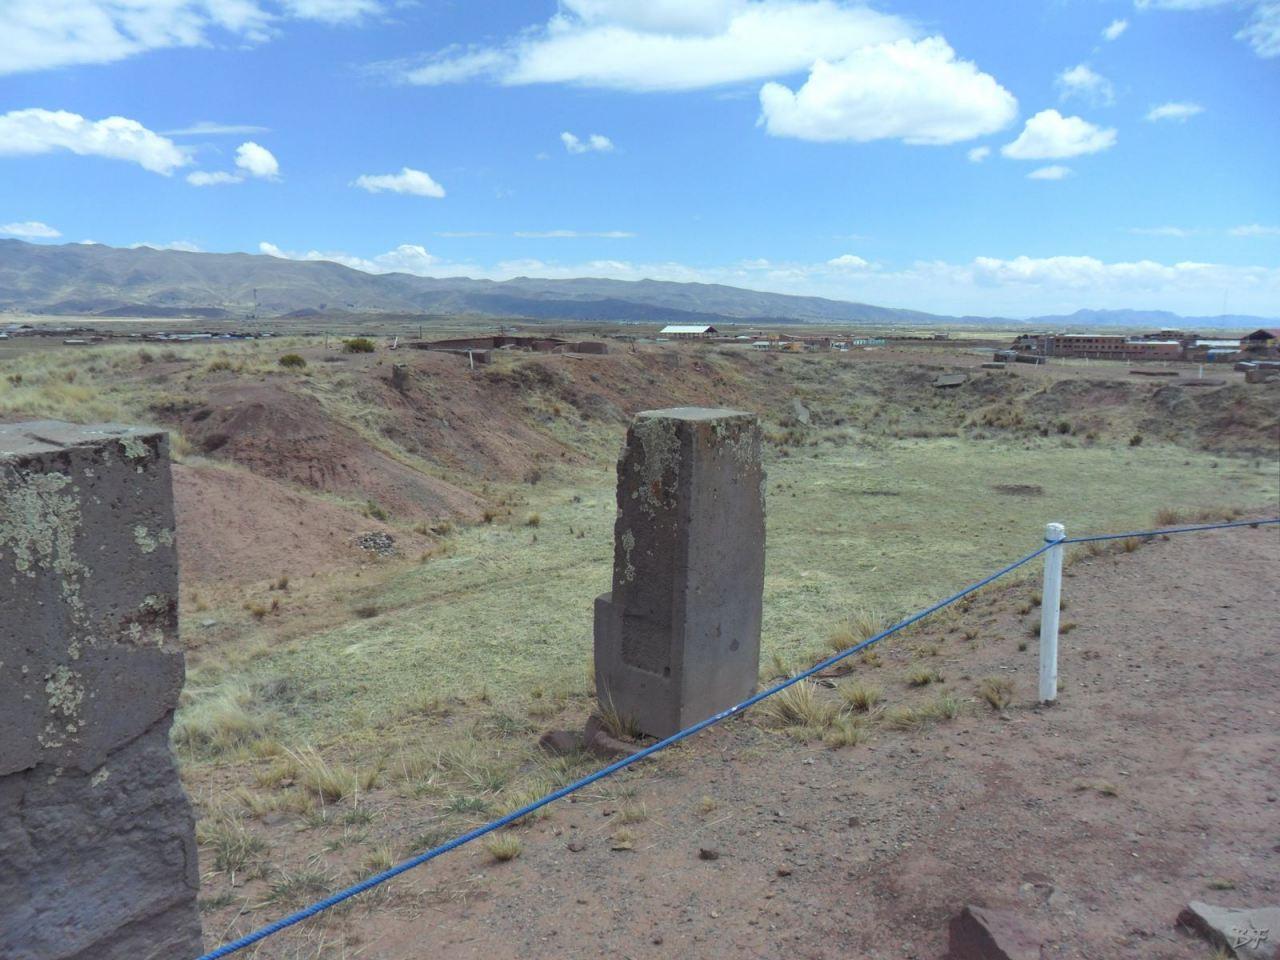 Sito-Megalitico-Piramide-Akapana-Kalasasaya-Menhir-Tiahuanaco-Bolivia-116